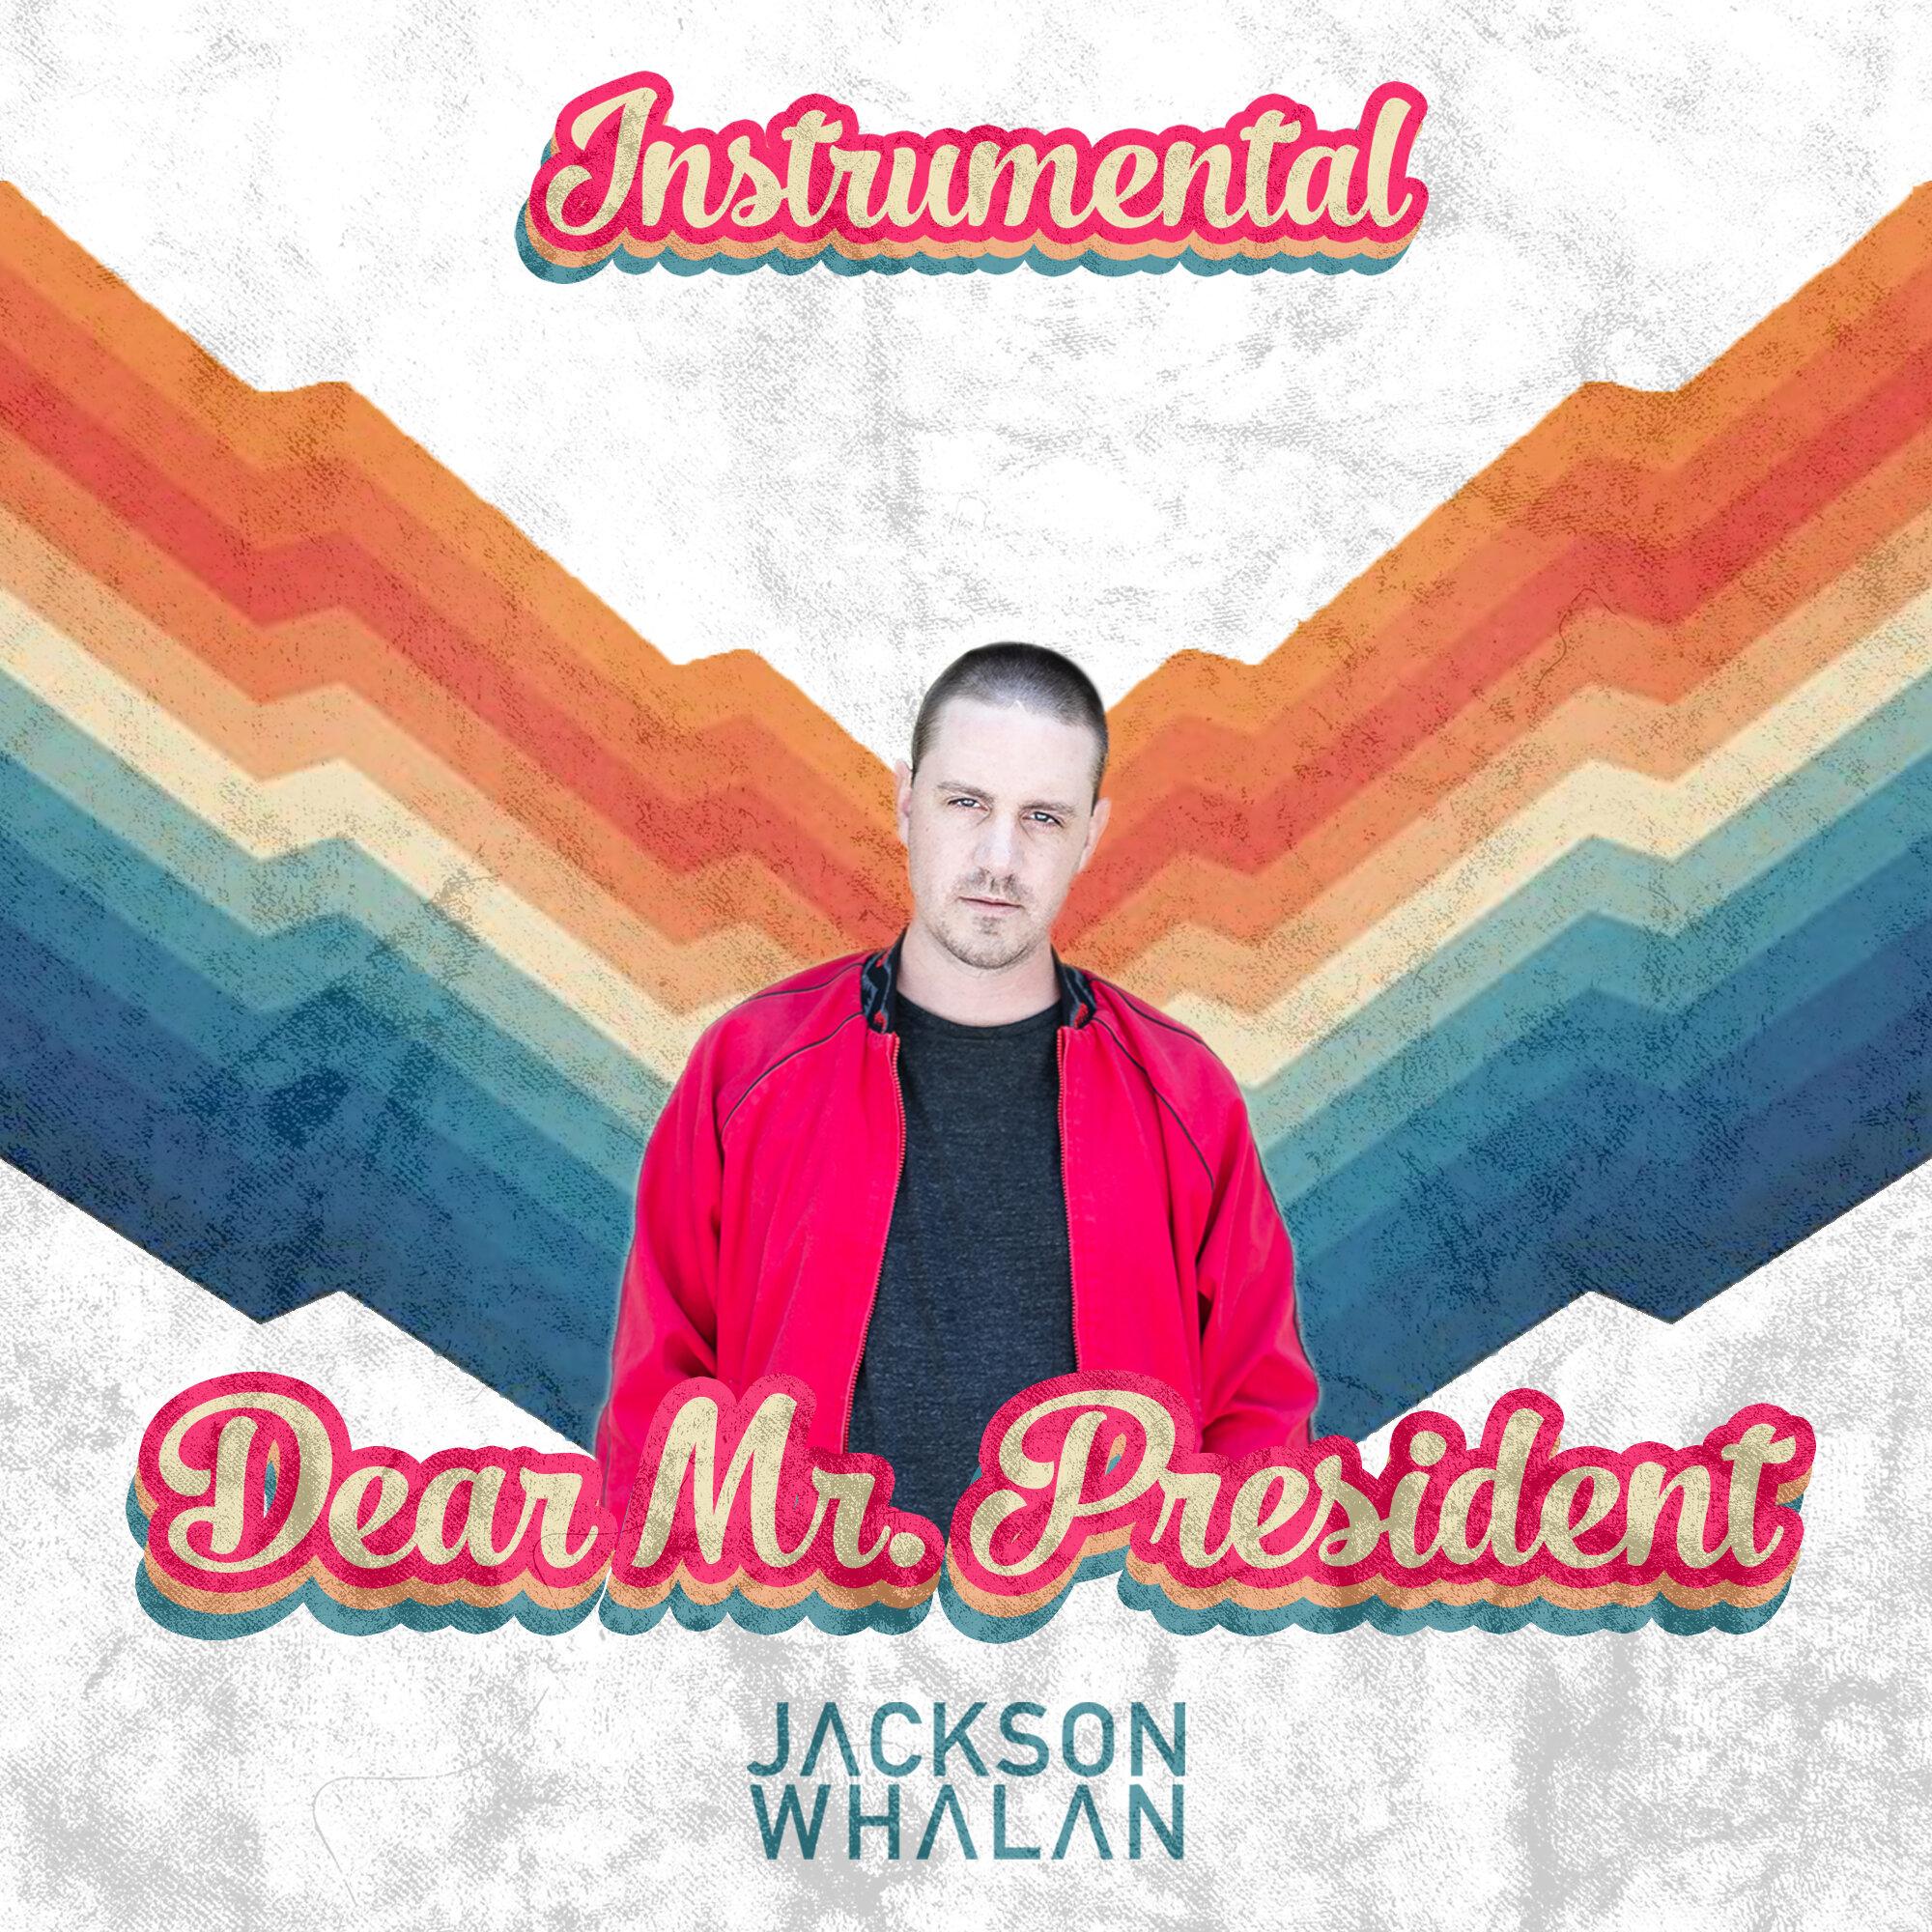 dear-mr-president-beat-instrumentals-rap-beats-hip-hop-jackson-whalan-music-boom-bap-free-underground-hip-hop-dr-dre